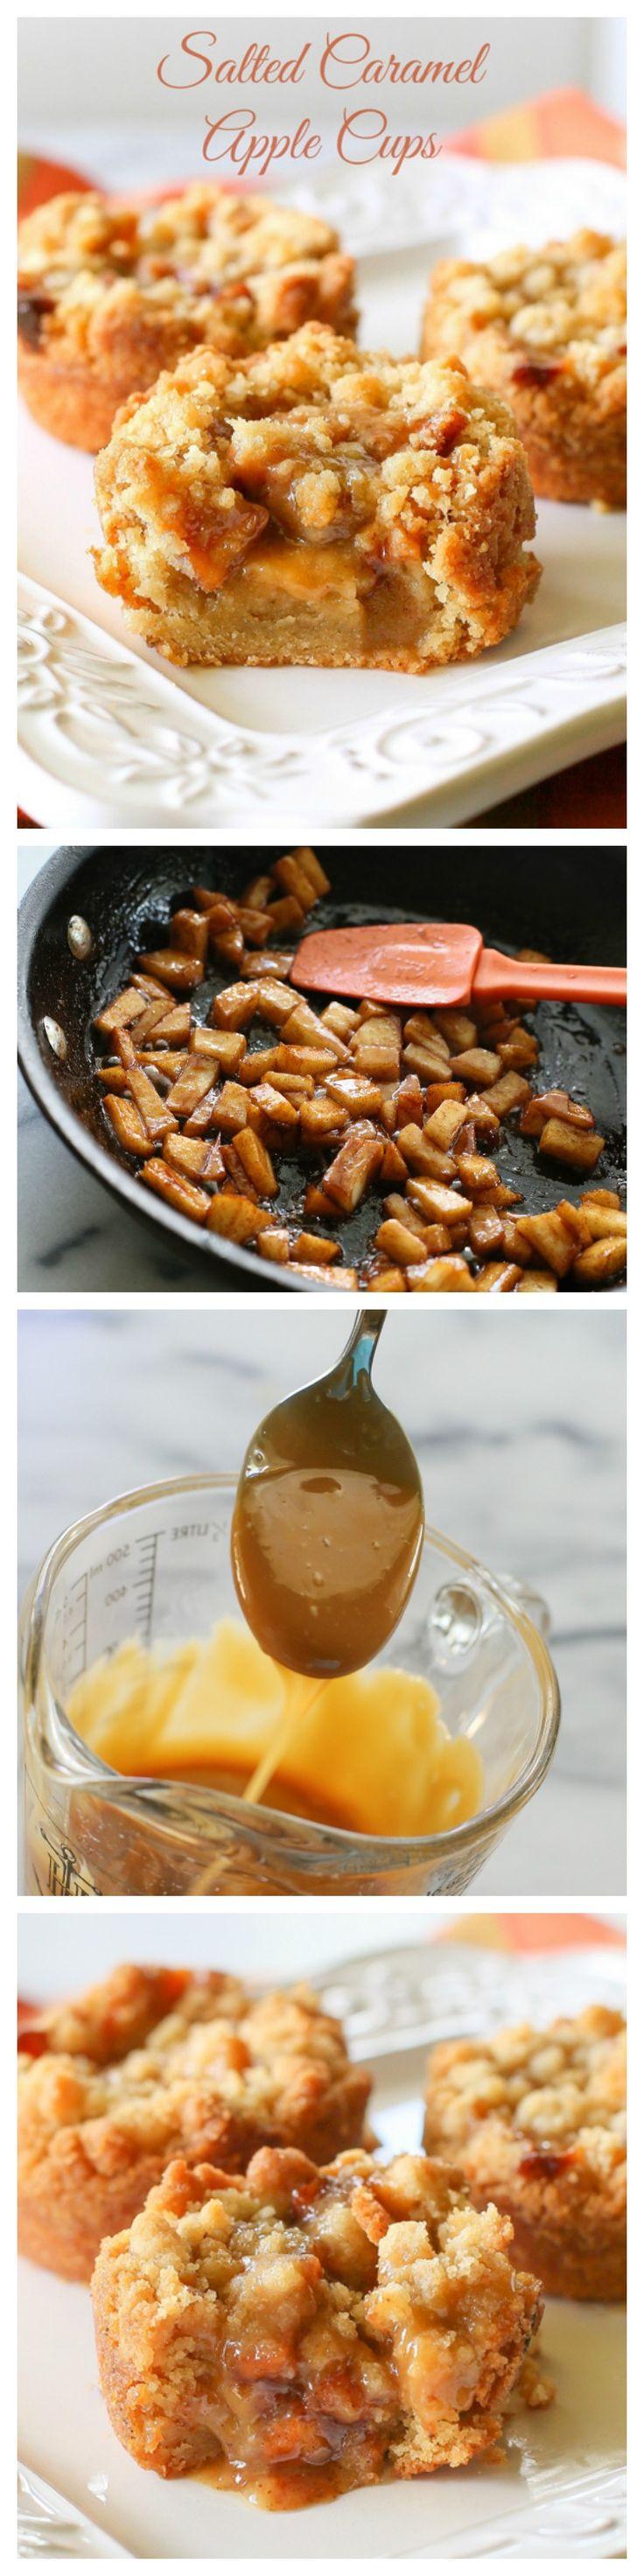 Salted Caramel Apple Cups